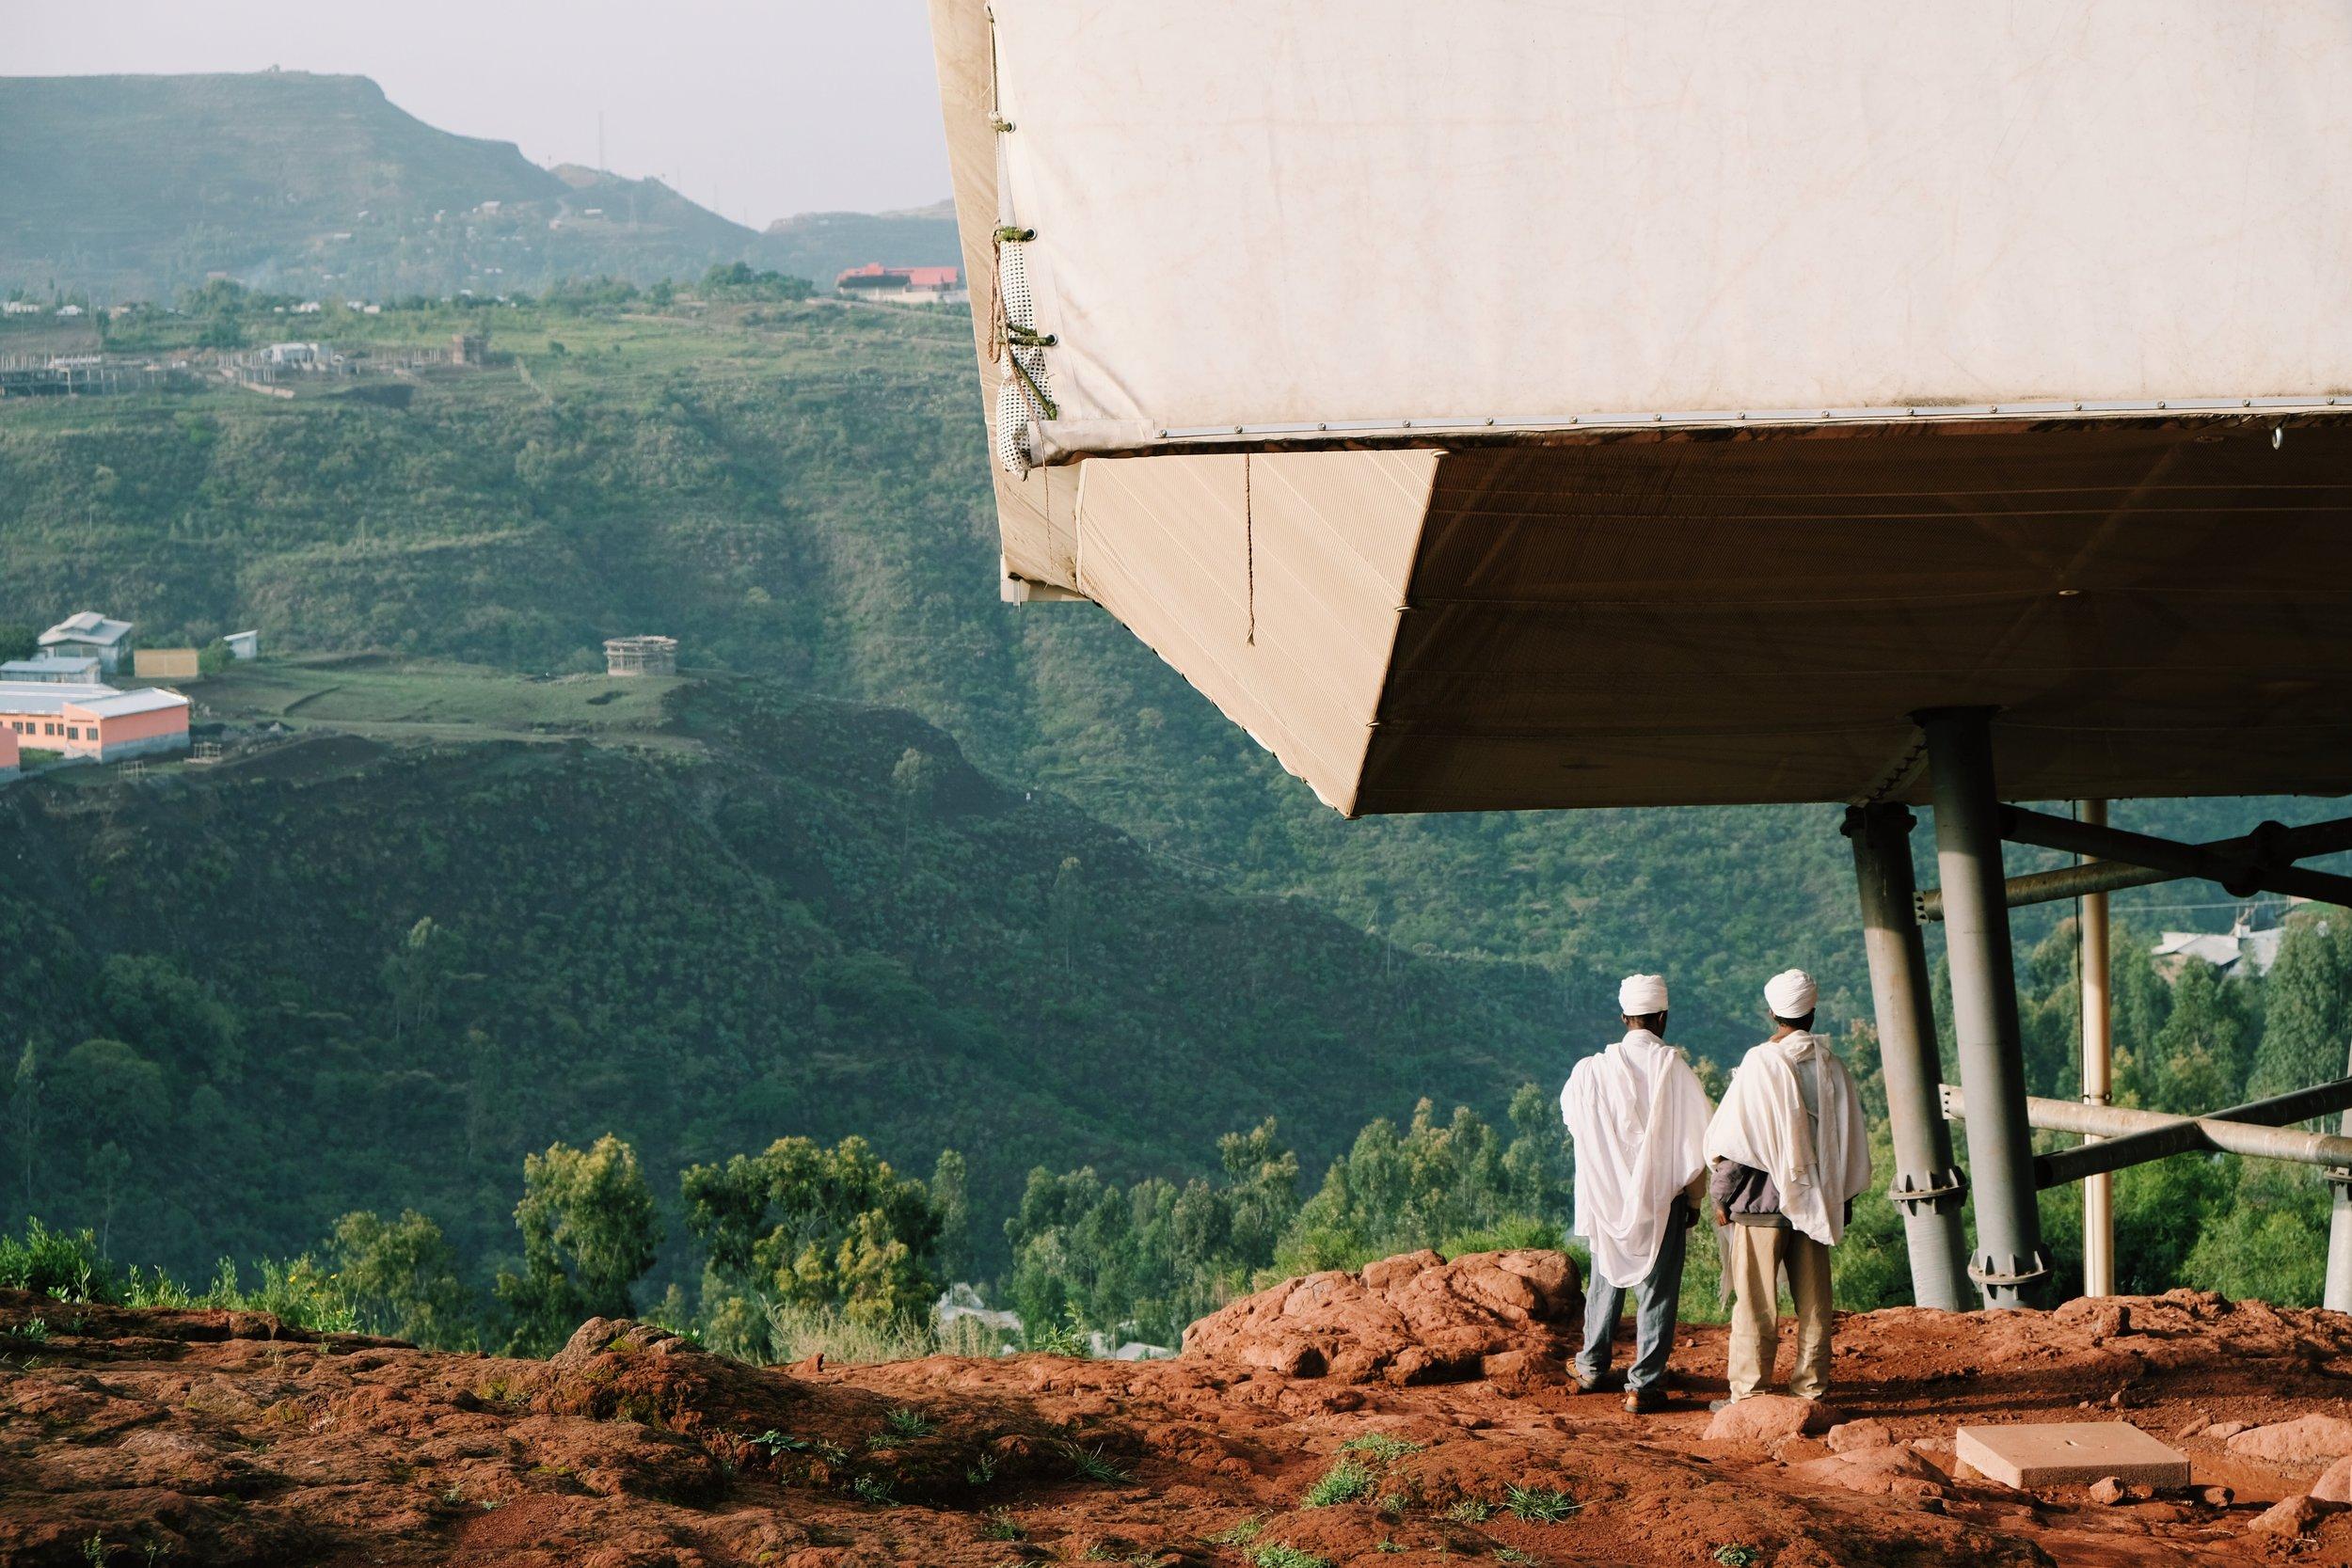 Mountains Lalibela in Ethiopia by Joost Bastmeijer.jpeg